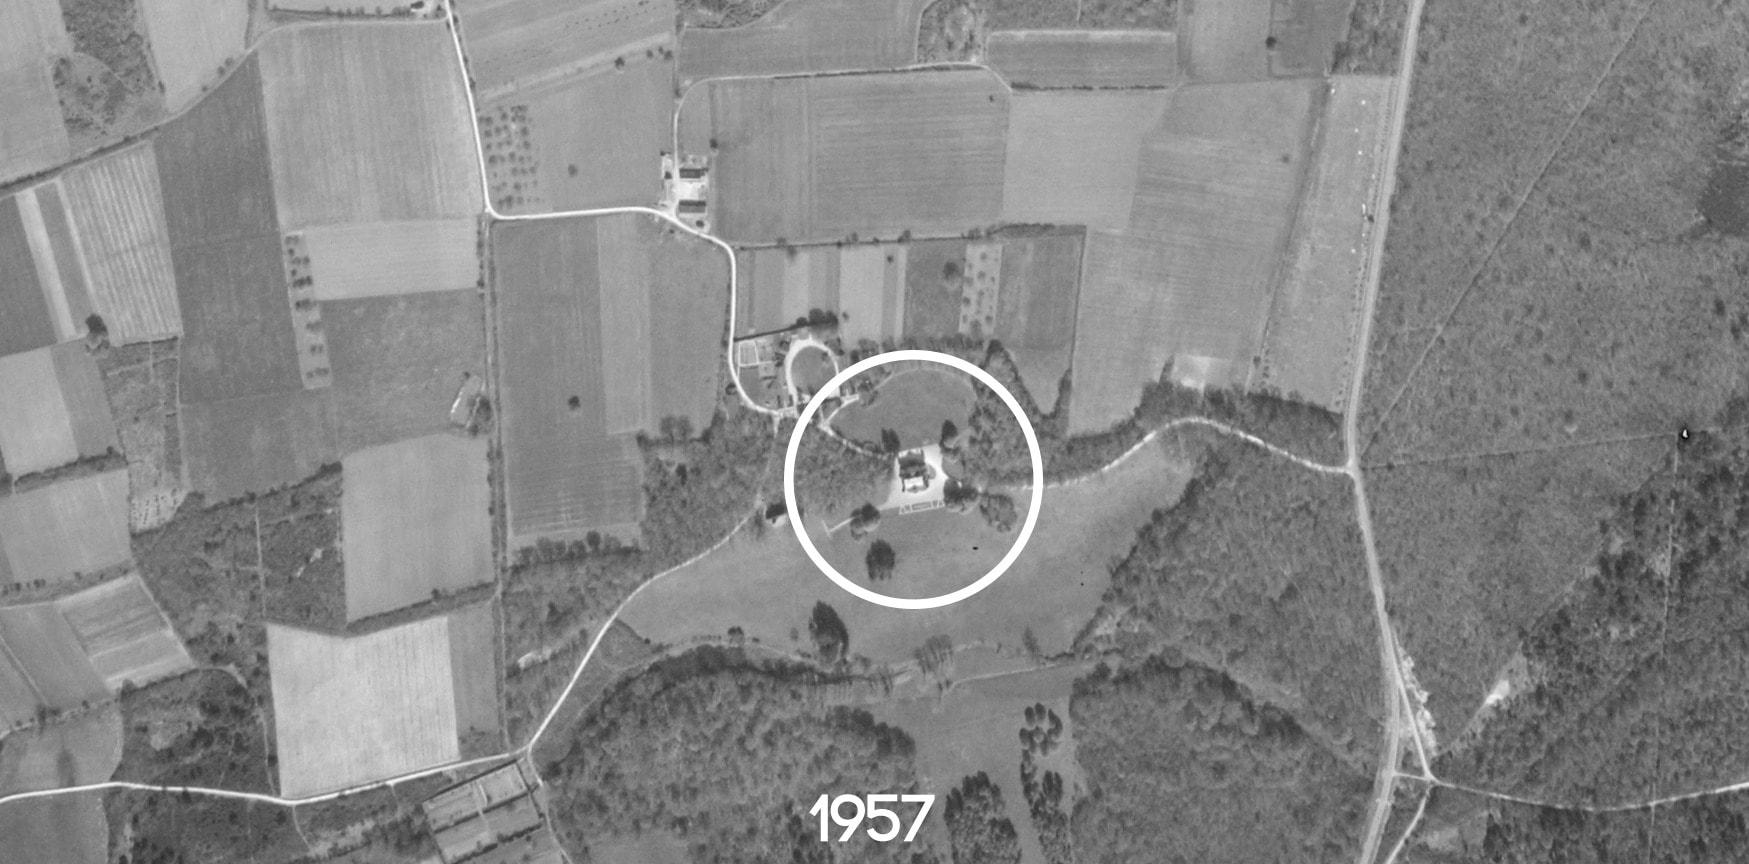 chateau-vasiliy-kulik-map-1957